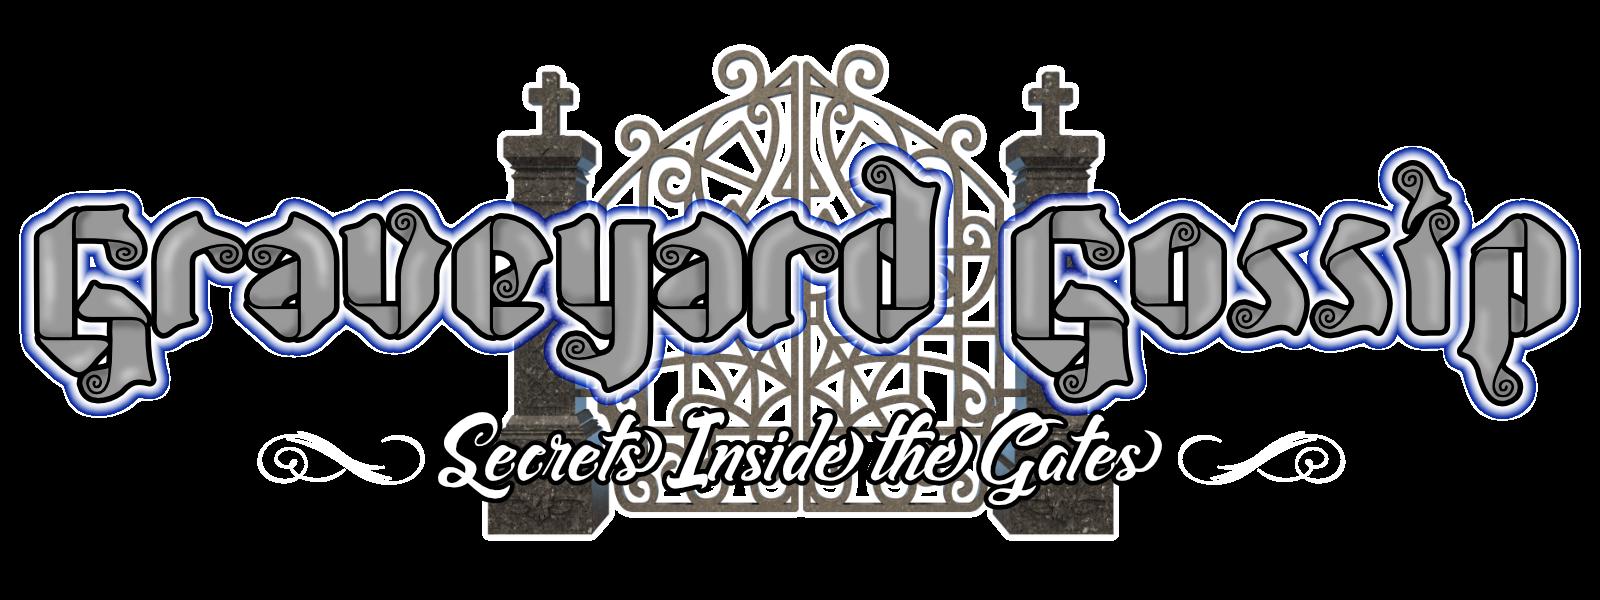 graveyard gossip secrets inside the gates